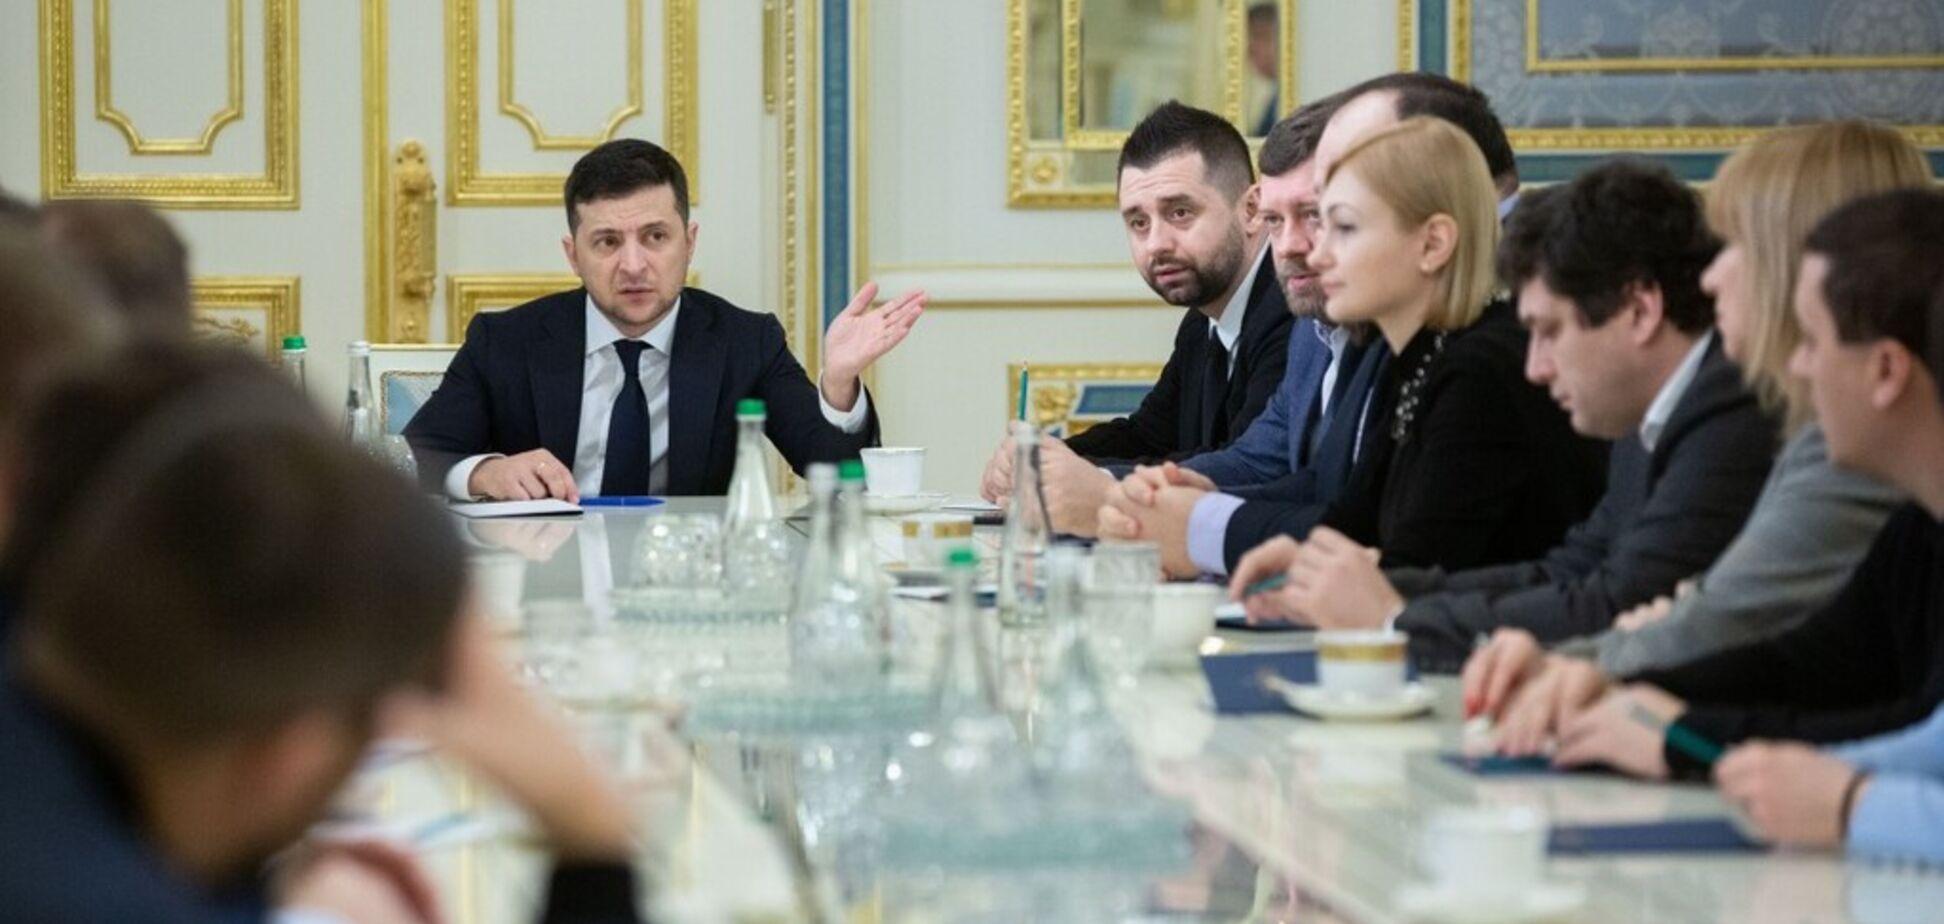 Зеленский внезапно отозвал законопроект о децентрализации